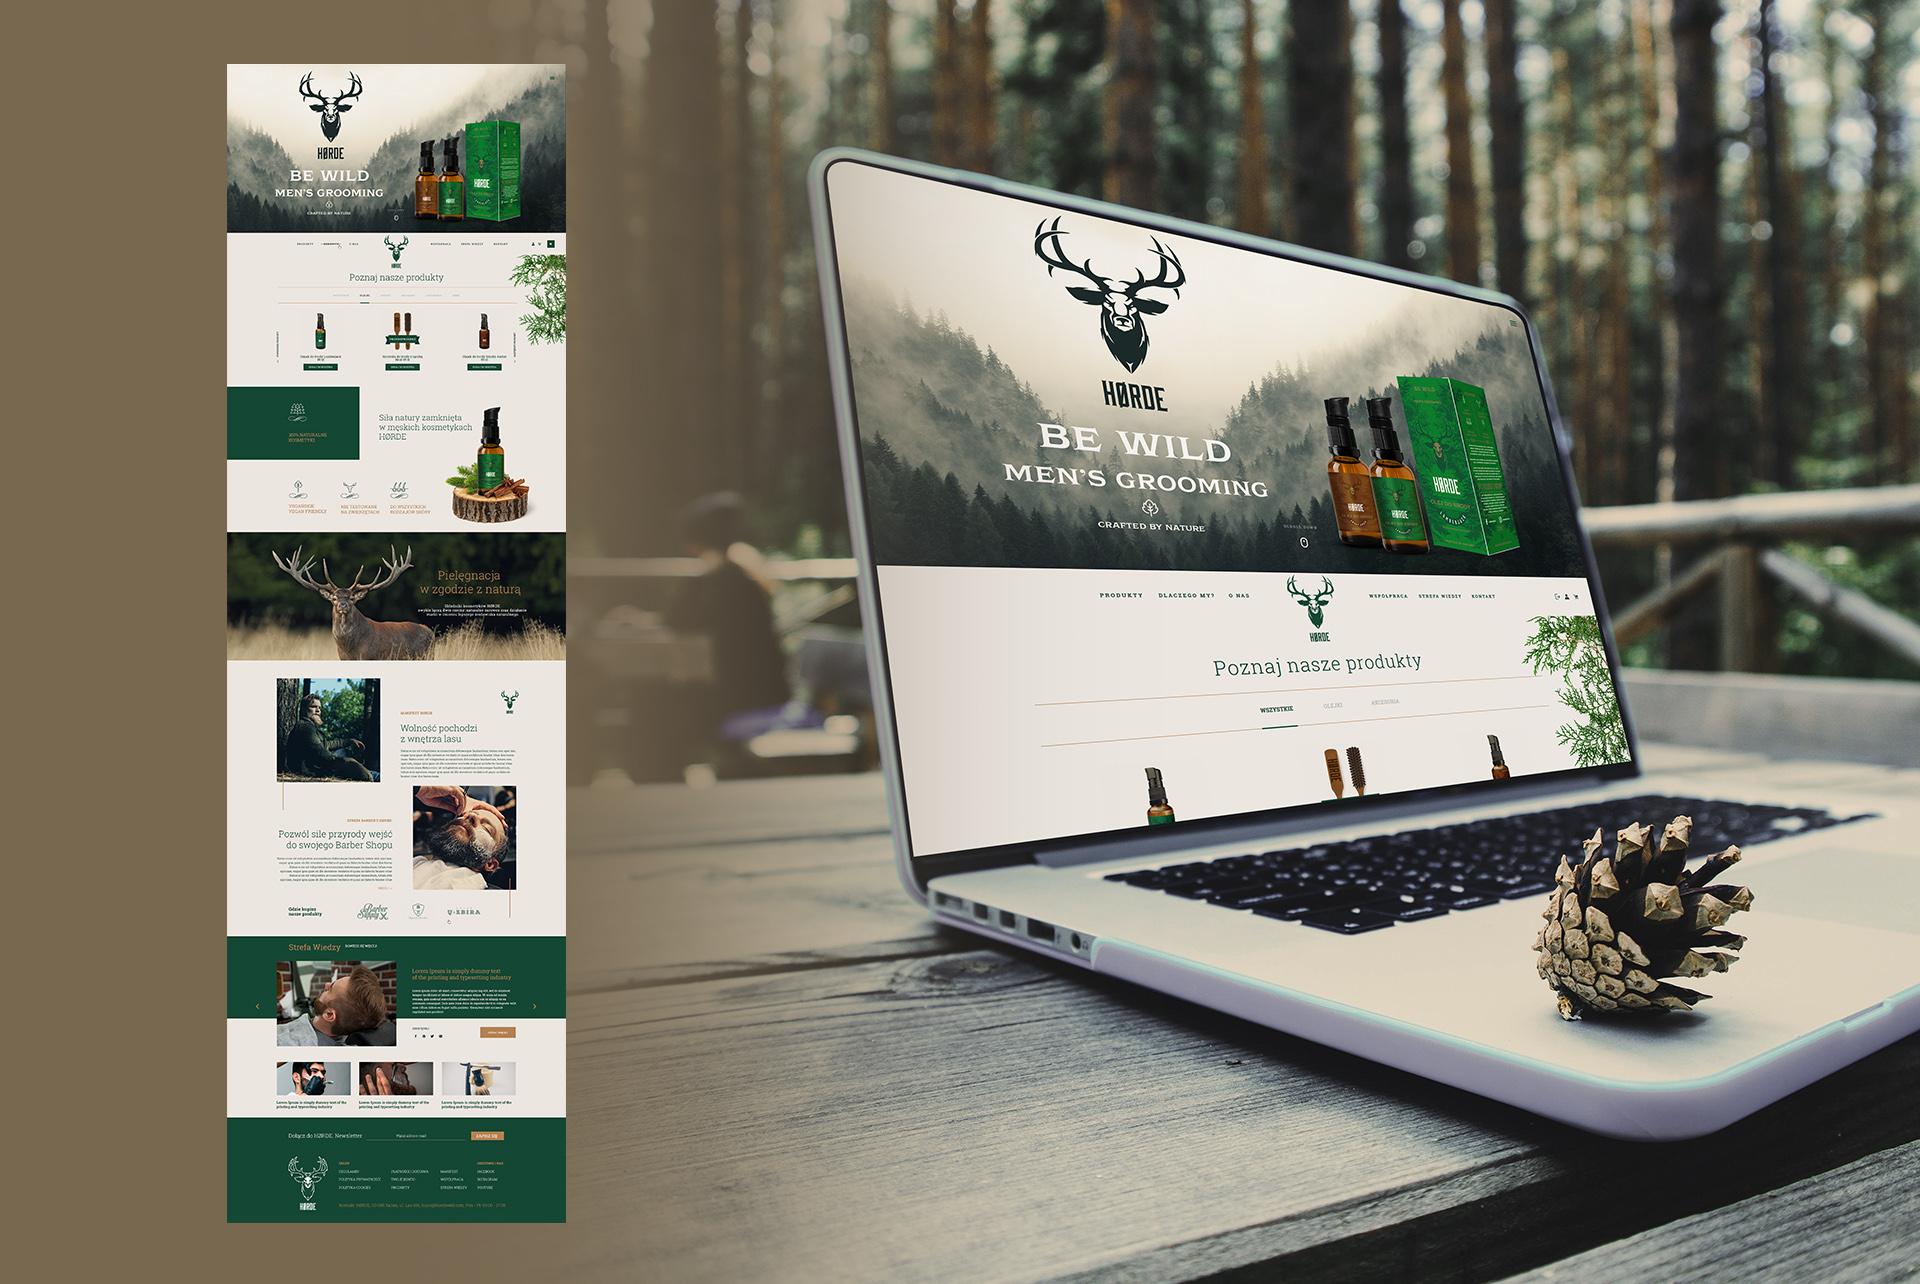 Horde Barber Web Design Branding